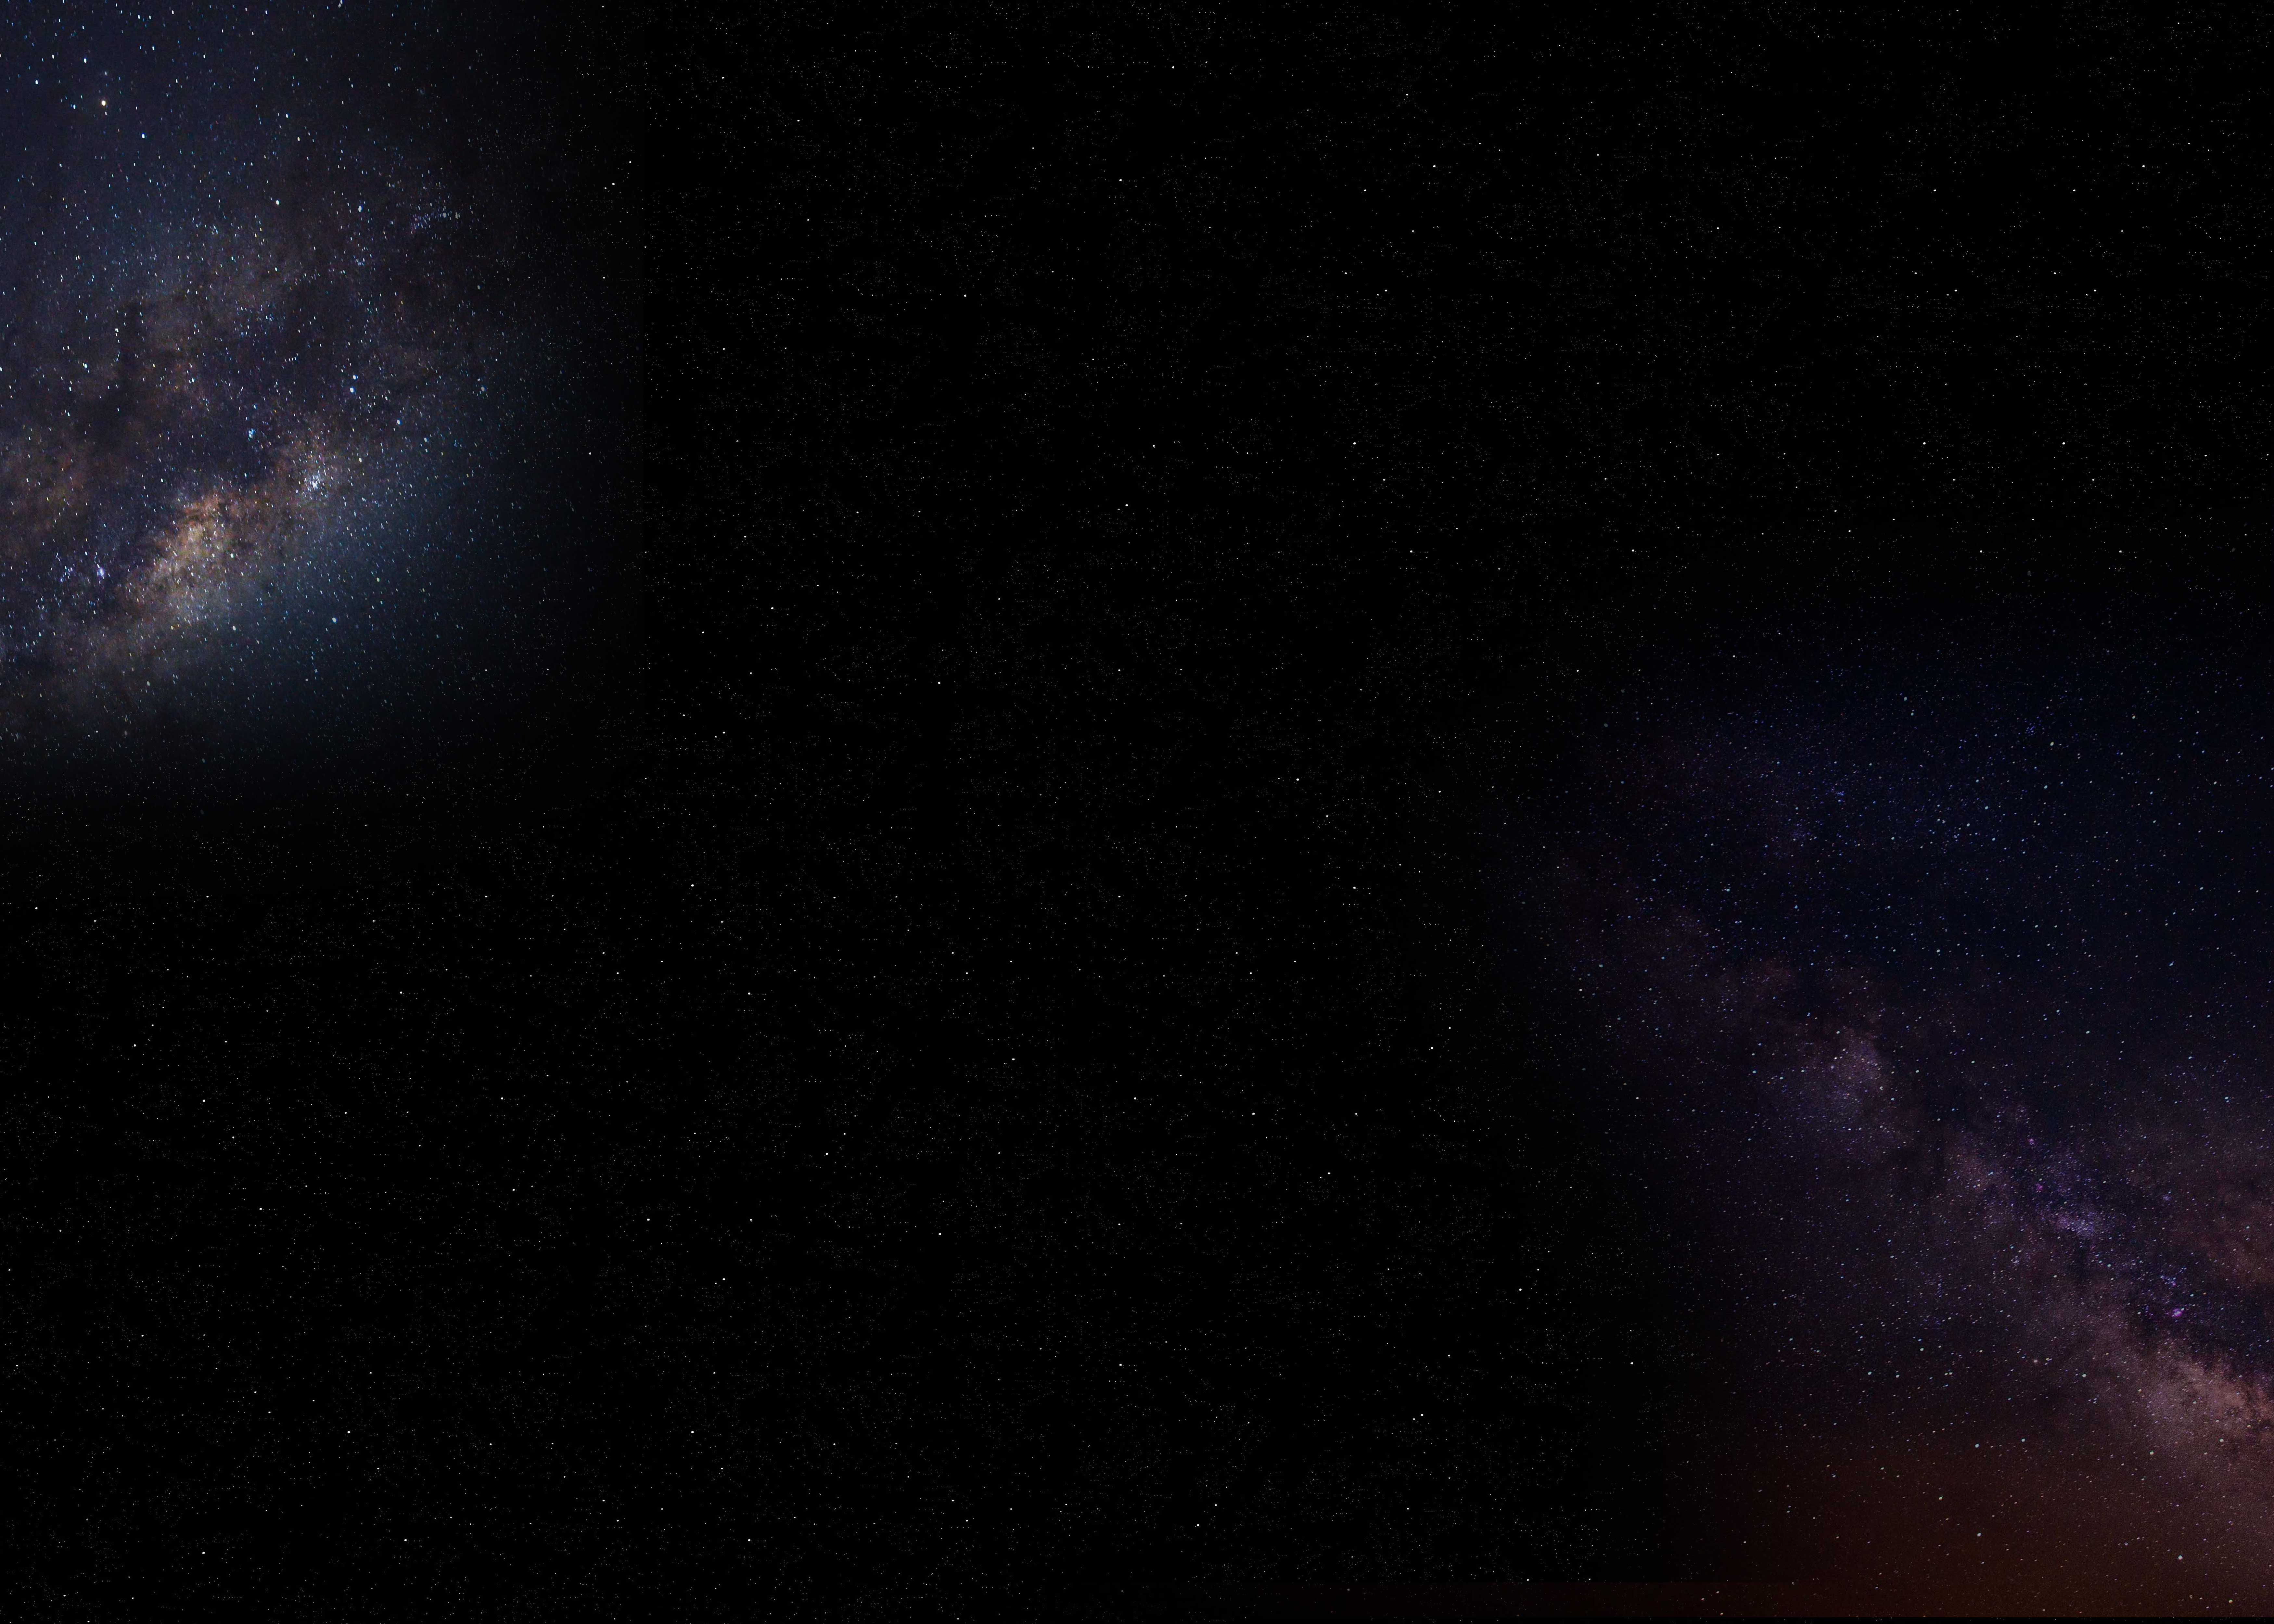 Nguyen Huu Phuc Portfolio - Background Deep Space